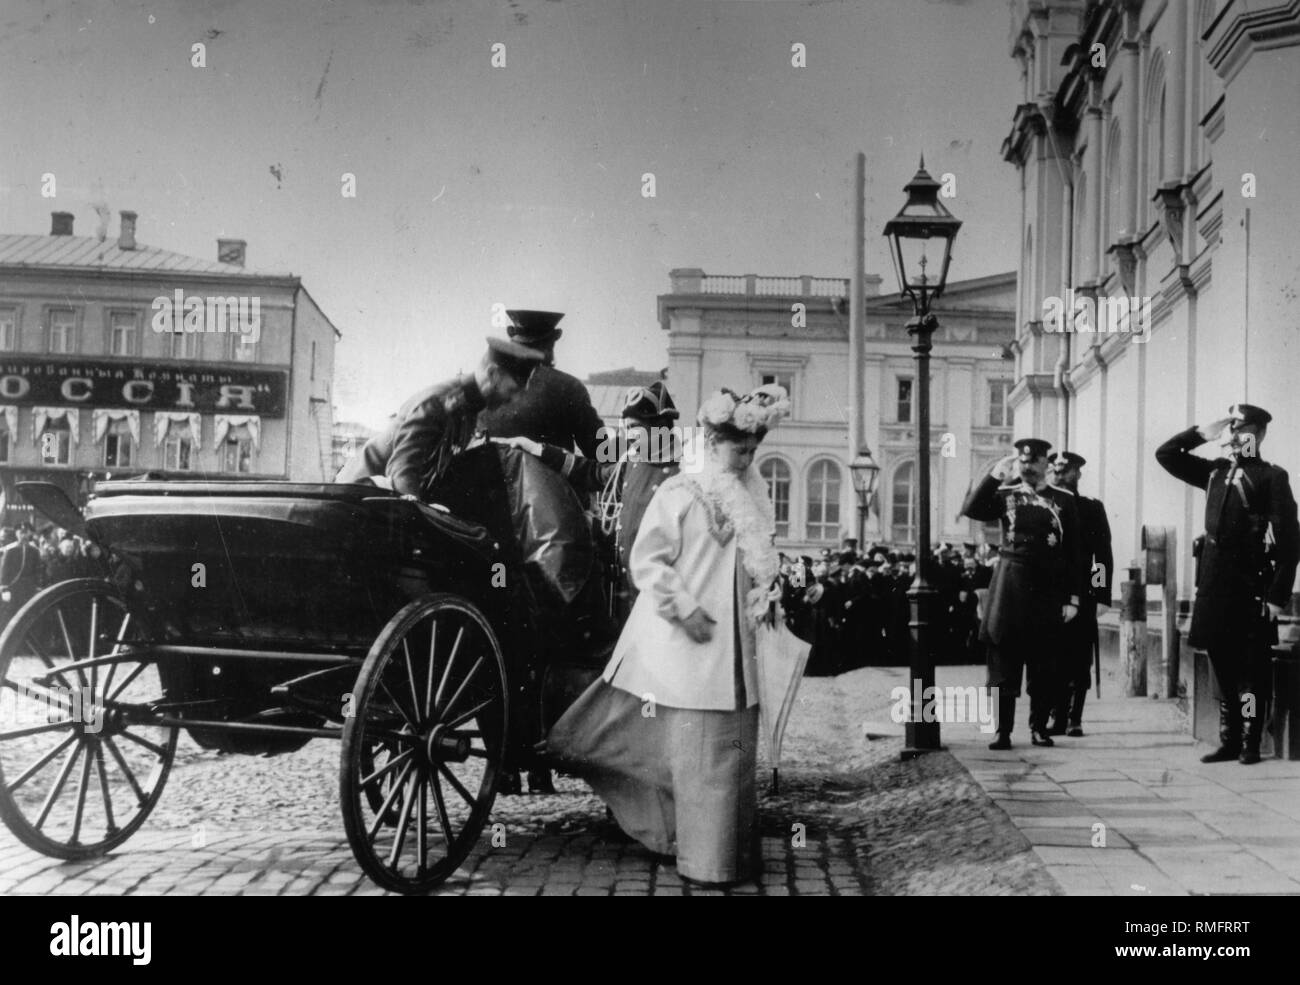 Arrival of Tsar Nicholas II and Tsarina Alexandra Fyodorovna in the Strastnoy Monastery in Moscow. Silver Gelatin Photography Stock Photo